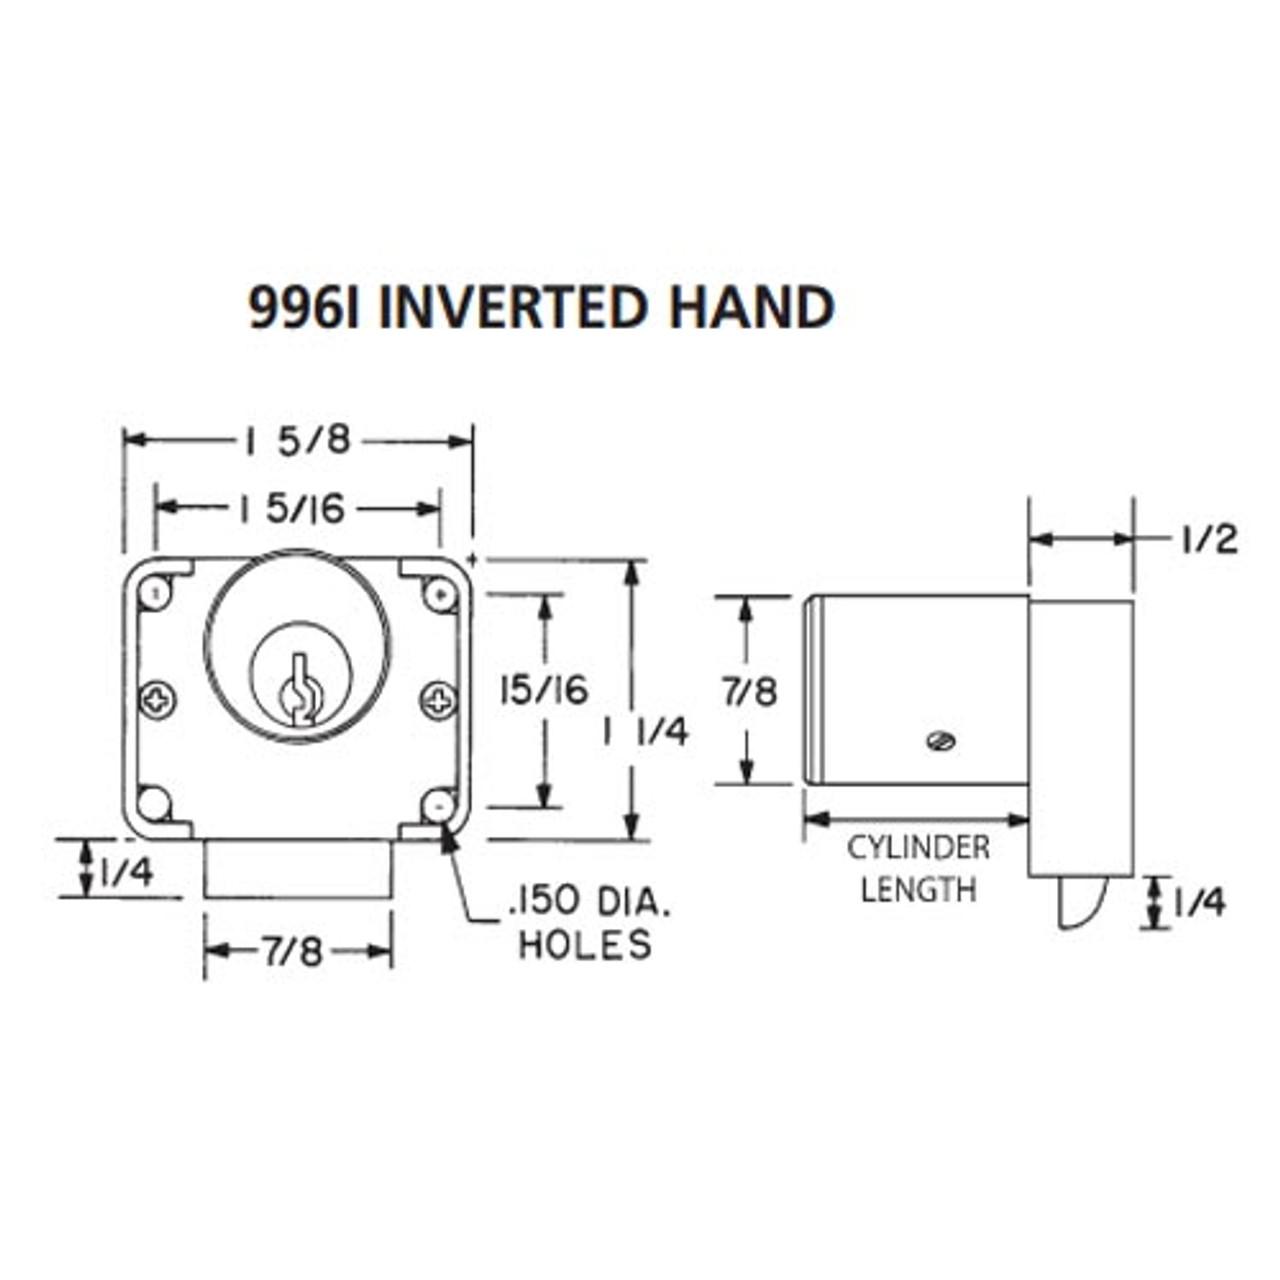 Olympus 996I-IH-KA4T2-26D-7/8 R Series Inverted Handing Cabinet Drawer Latch Lock in Satin Chrome